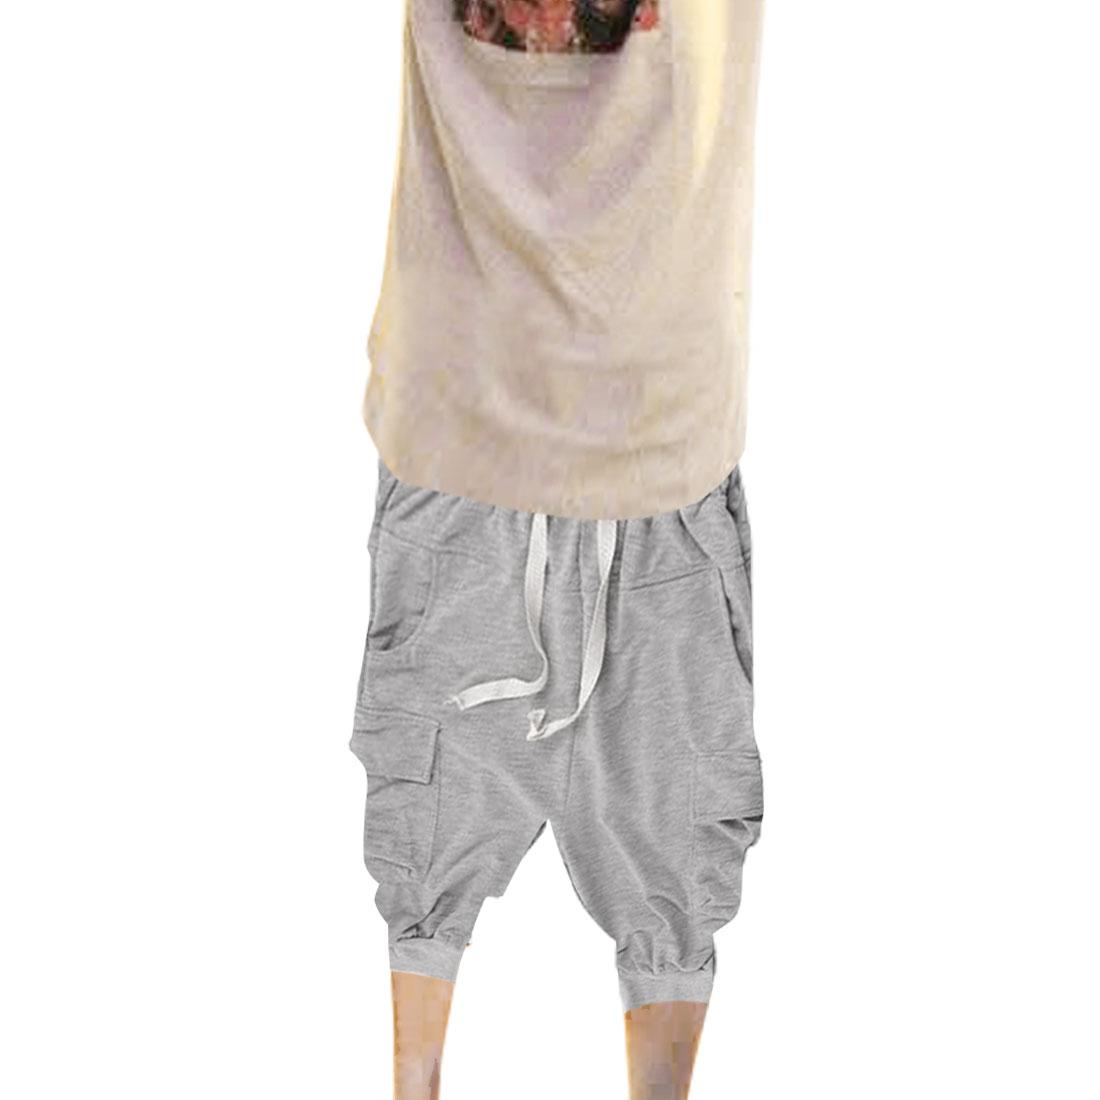 Slanting Pockets Stretchy Waist Casual Five Harem Pants Gray W29 for Men